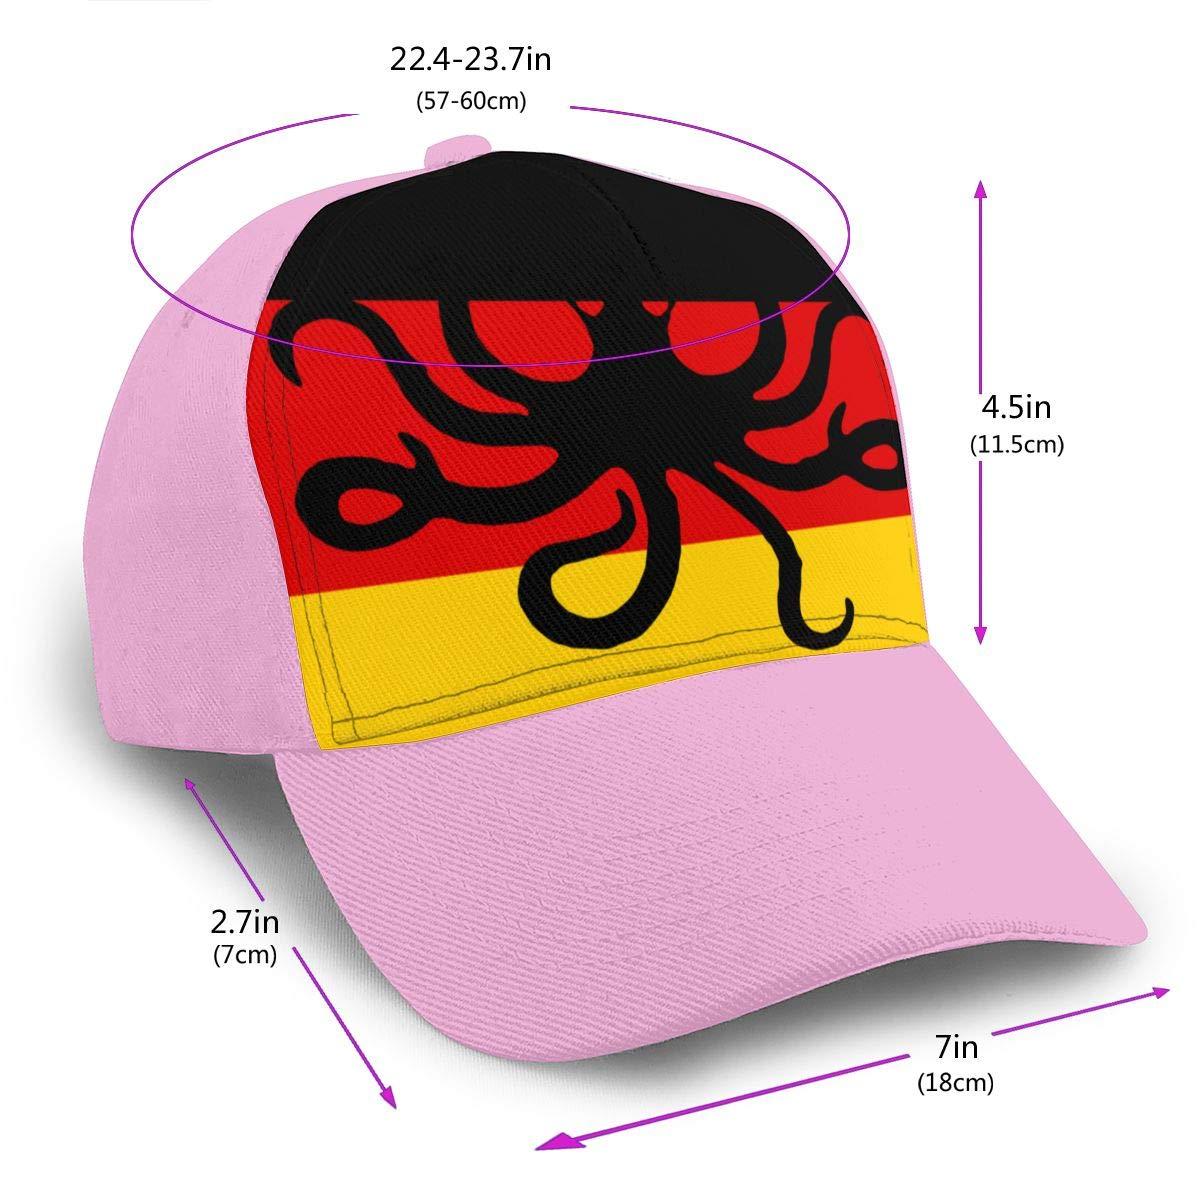 Octopus German Flag Baseball Cap for Men and Women Cotton Cricket Cap